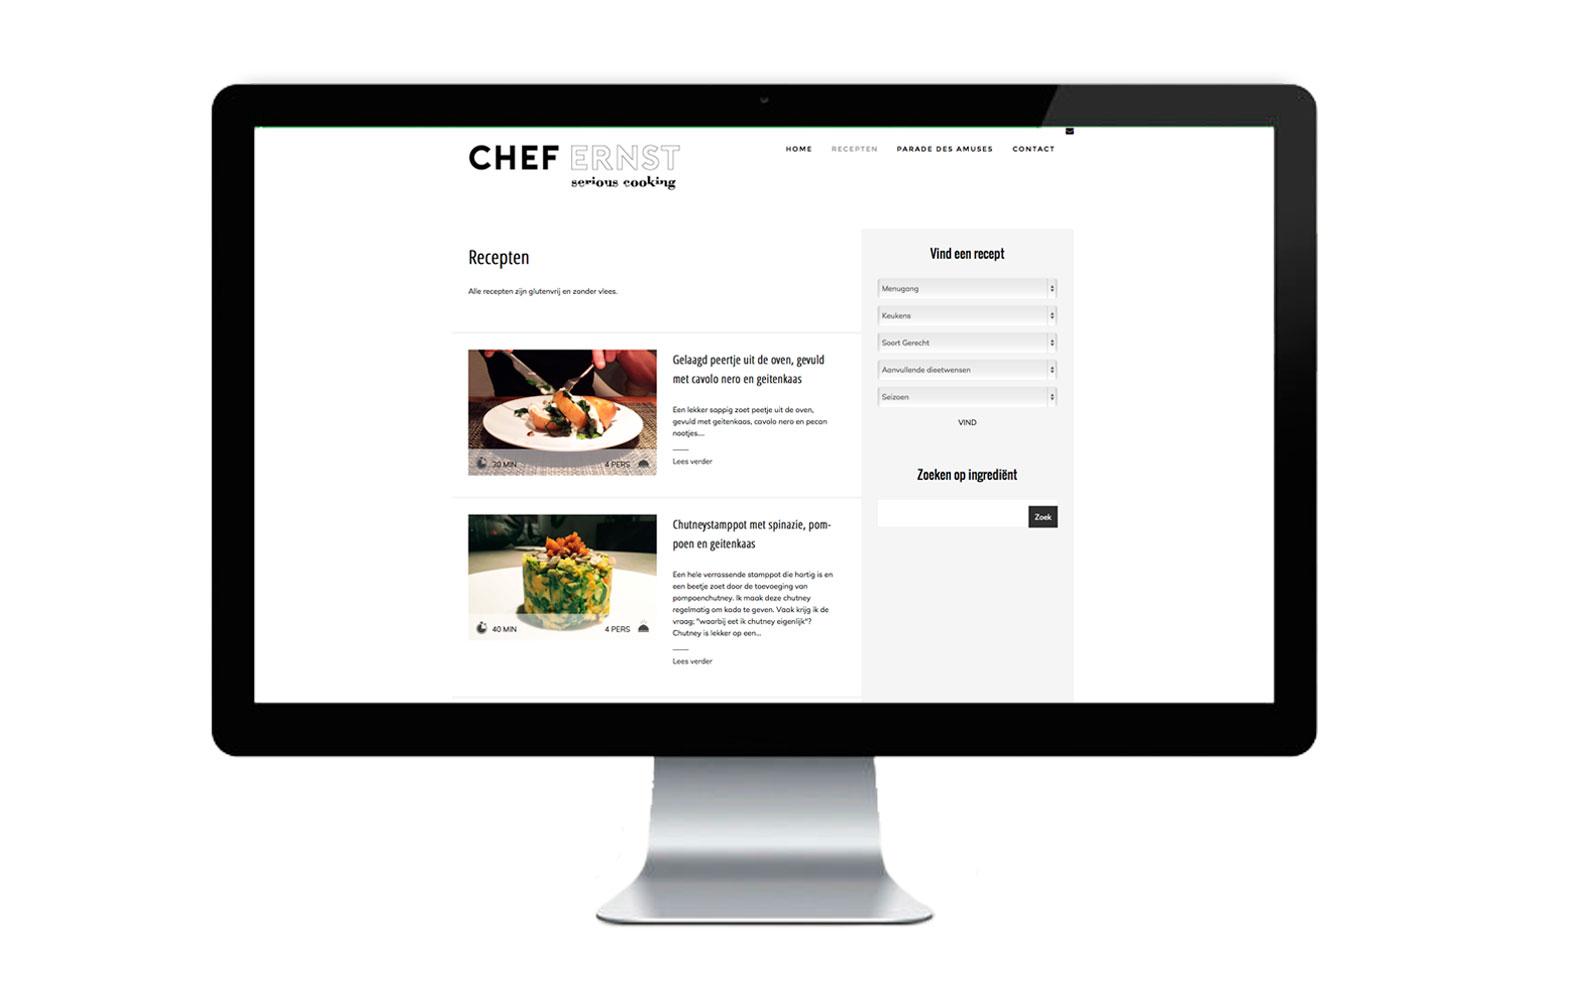 Chef-Ernst-serious-cooking-website-recepten-Studio-Ernst